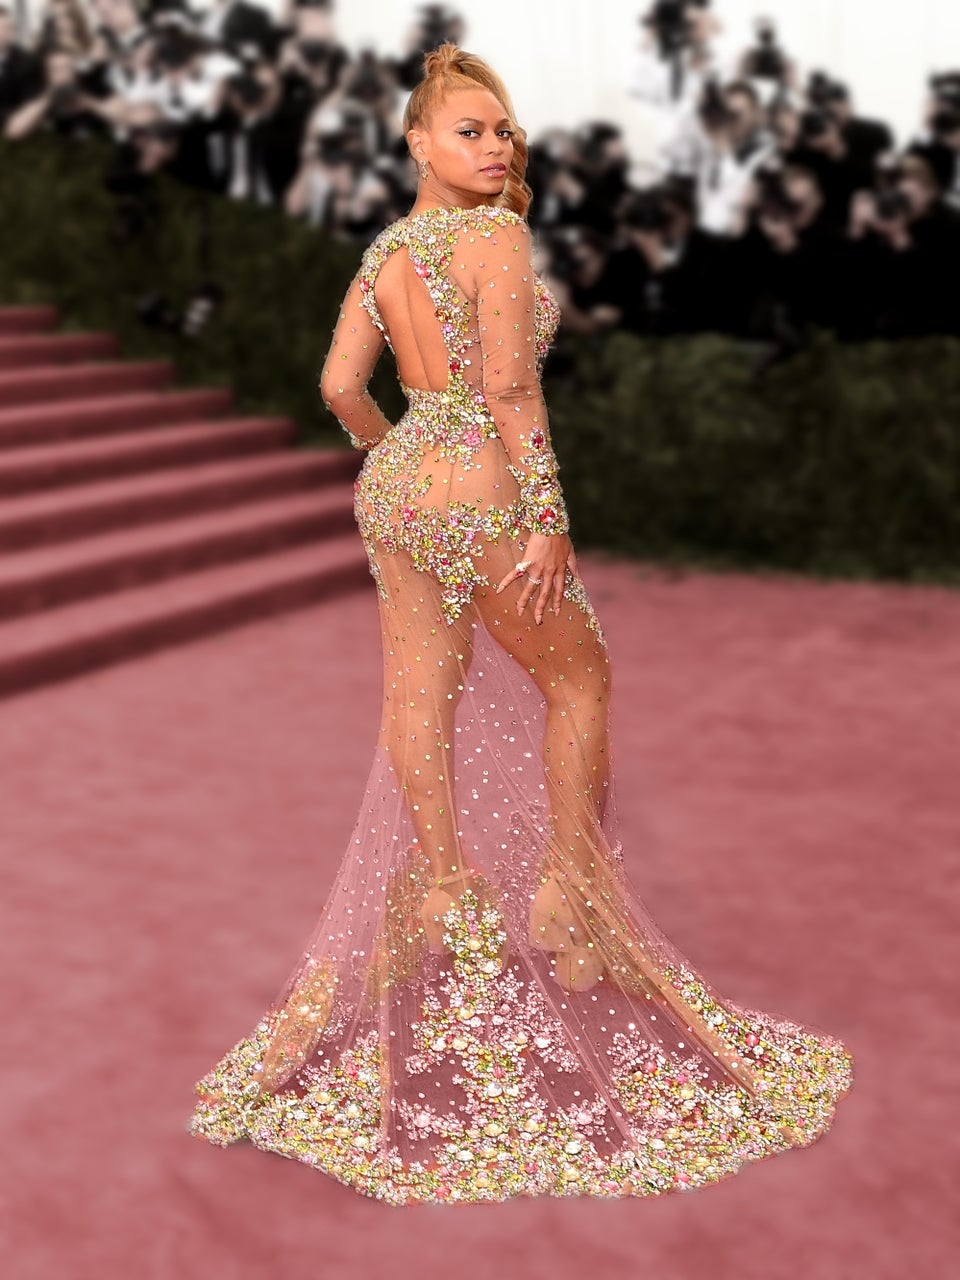 Teen Kills It In Beyoncé-Inspired Prom Dress